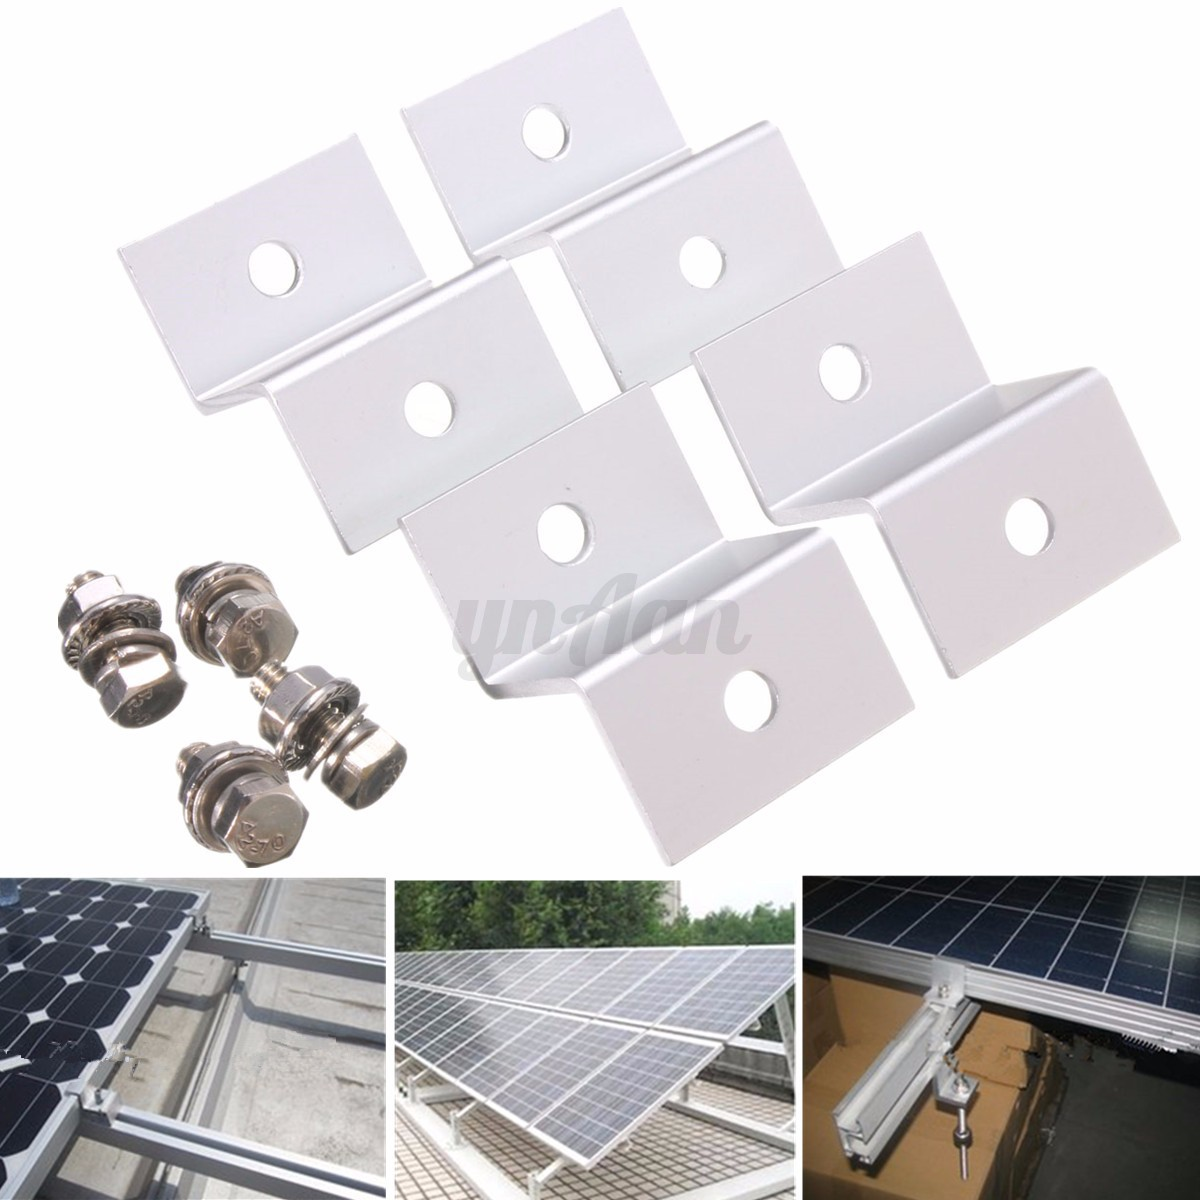 100w 200w 300w 400w 500w 1kw semi flexible solarpanel solarmodul wohnmobil ebay. Black Bedroom Furniture Sets. Home Design Ideas